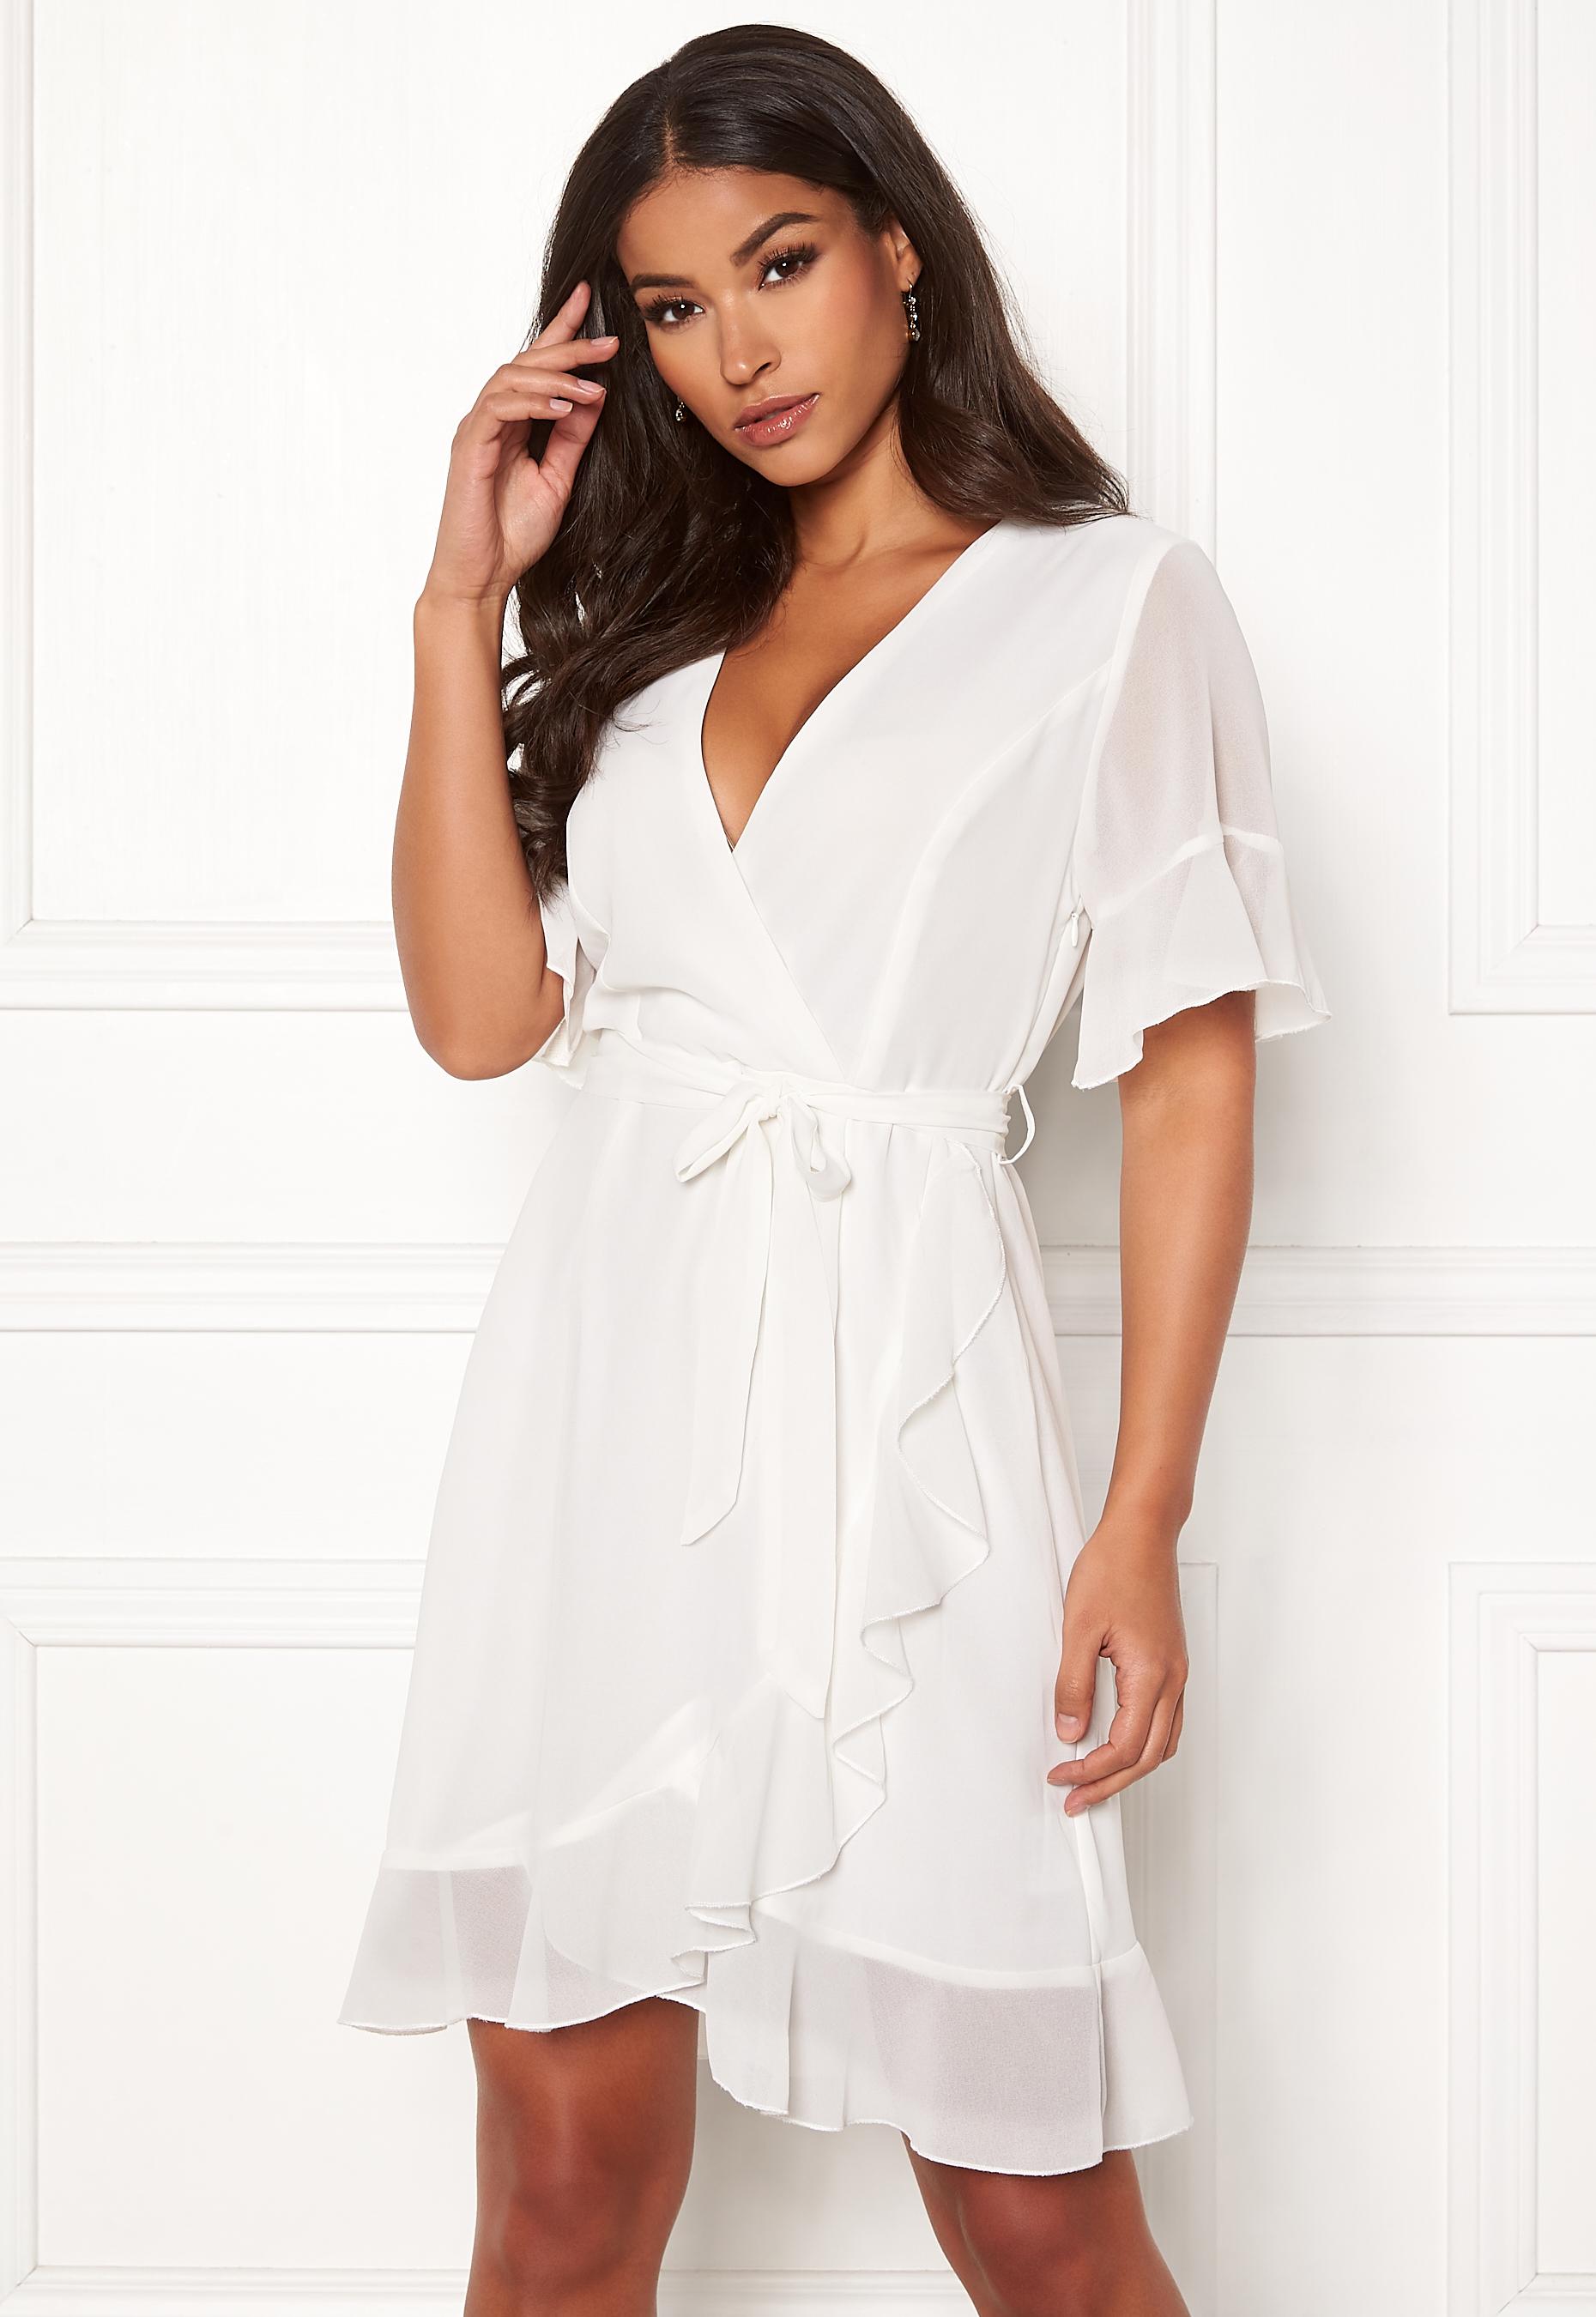 Sisters Point Greto Dress 115 Creme - Bubbleroom 2cfa96f9458b0